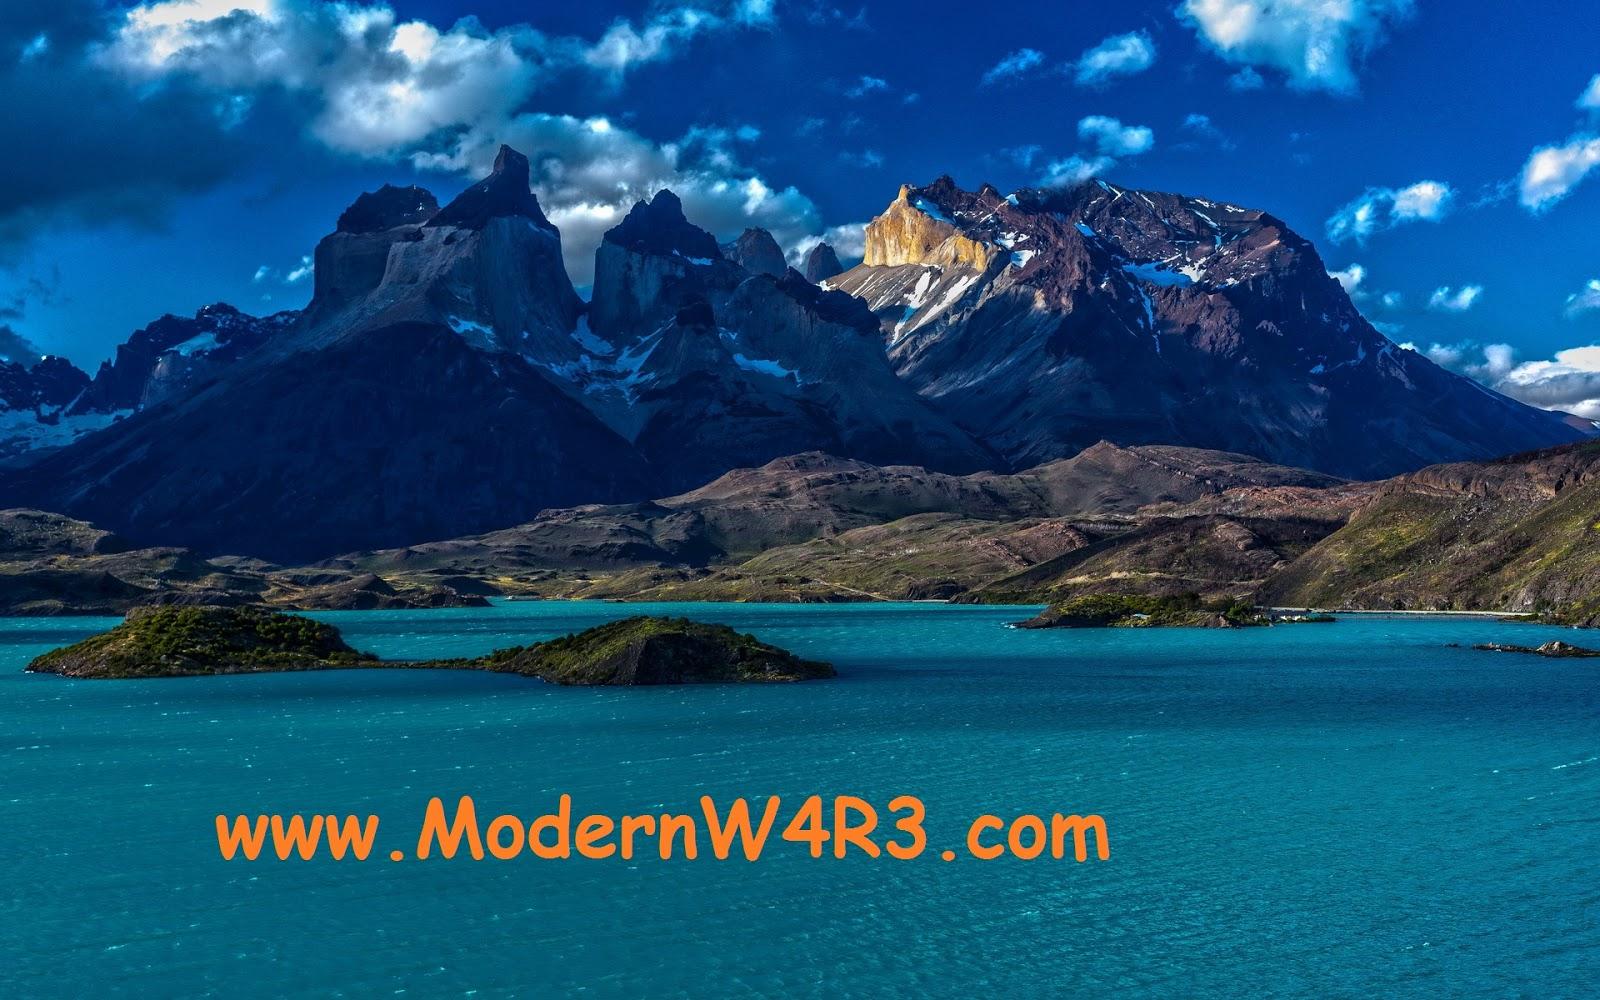 Landscapes HD Wallpaper ModernW4R3